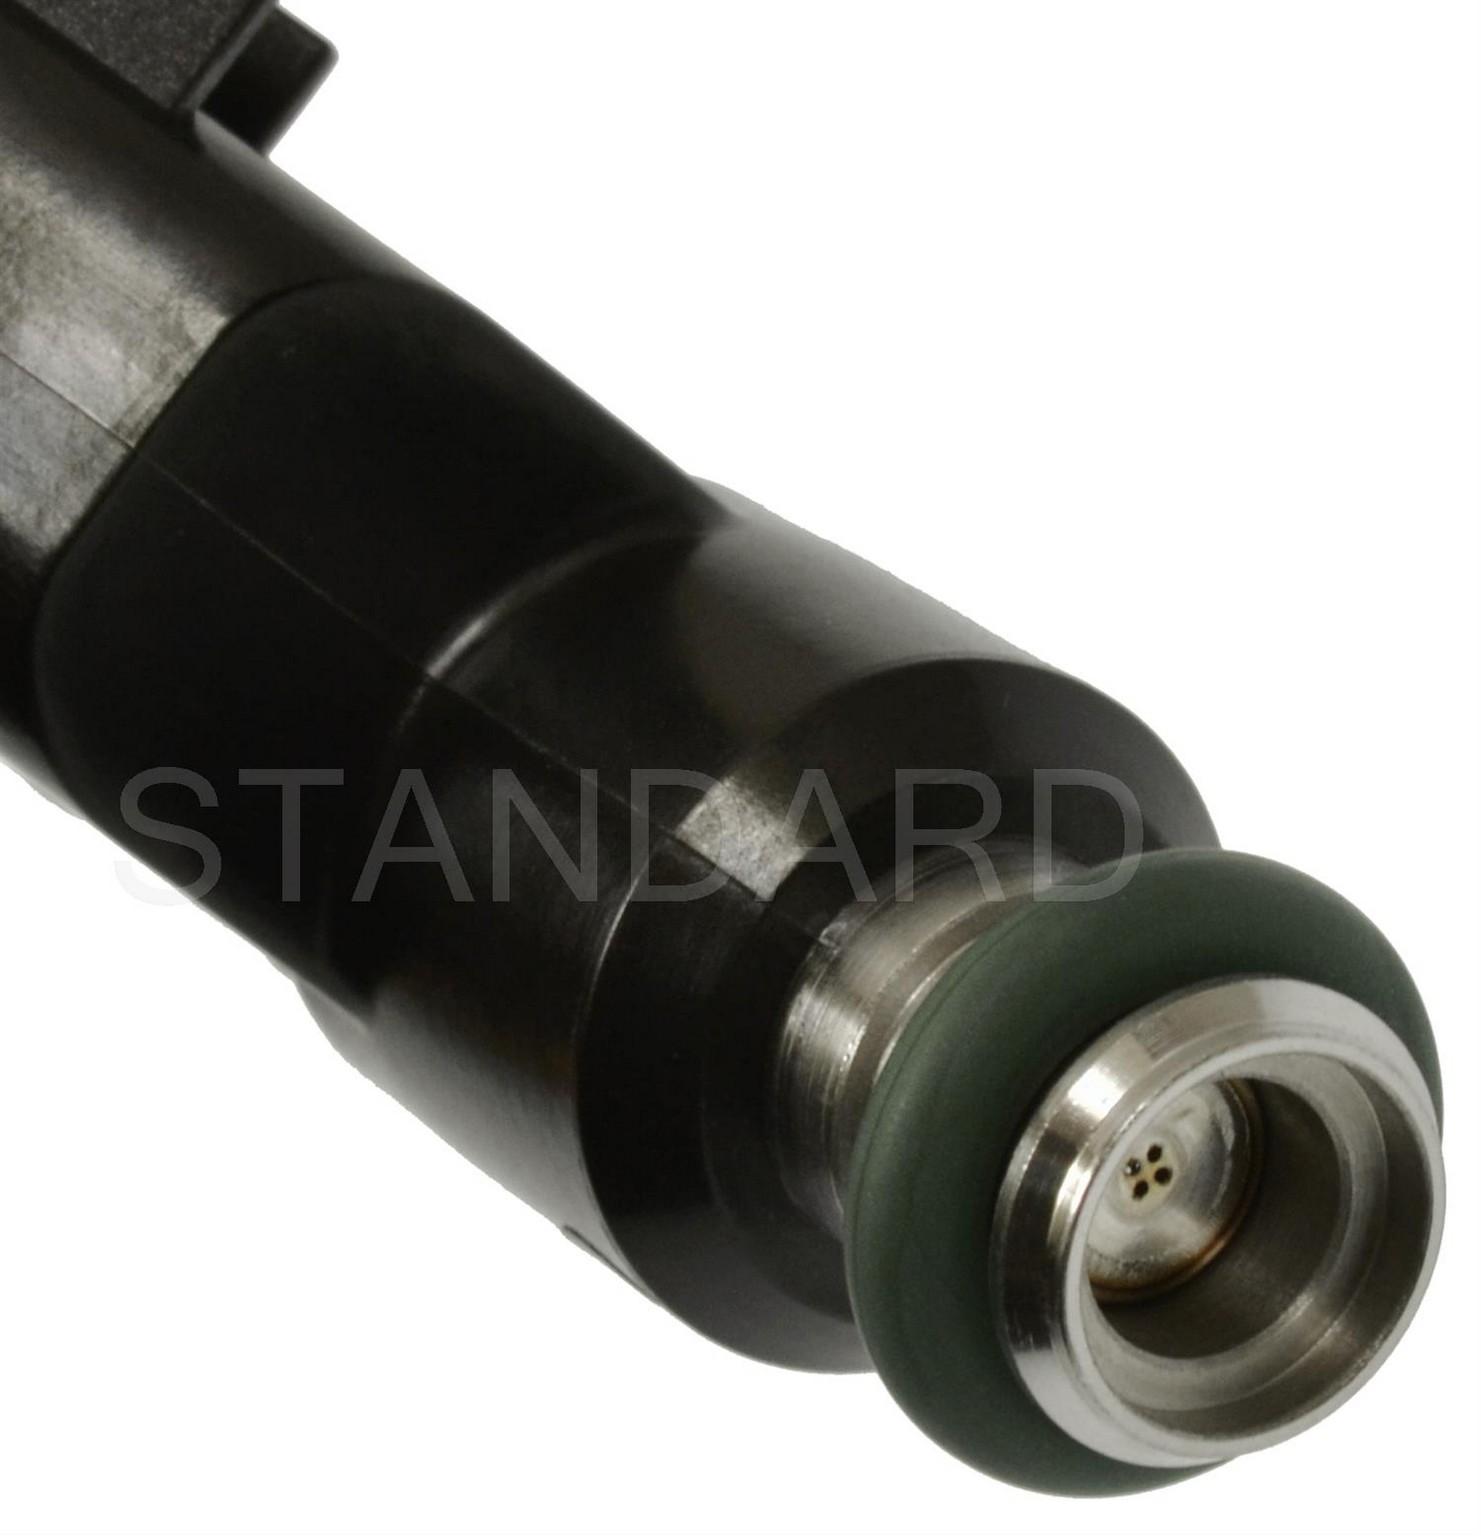 2012 Gmc Sierra 1500 Fuel Injector Yukon Filter Si Fj1061